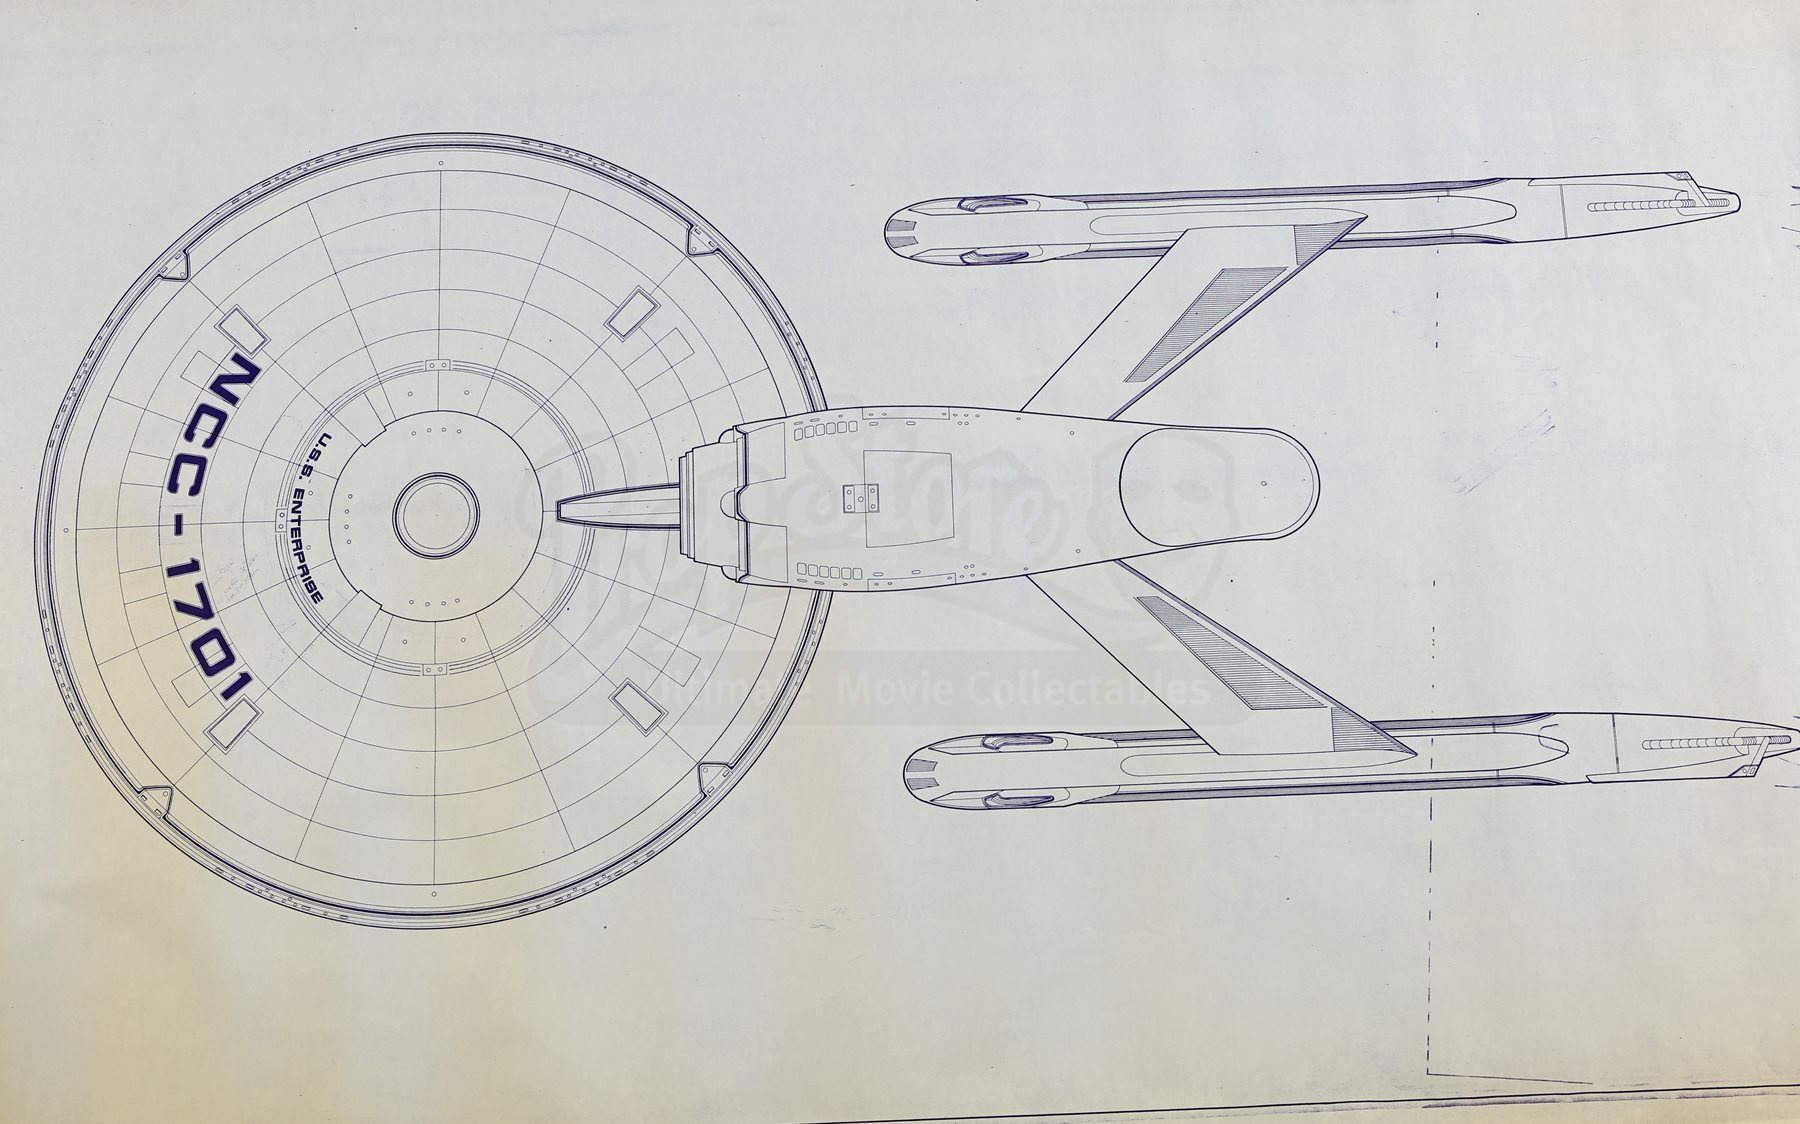 Star trek the motion picture uss enterprise ncc 1701 for Blueprint cost